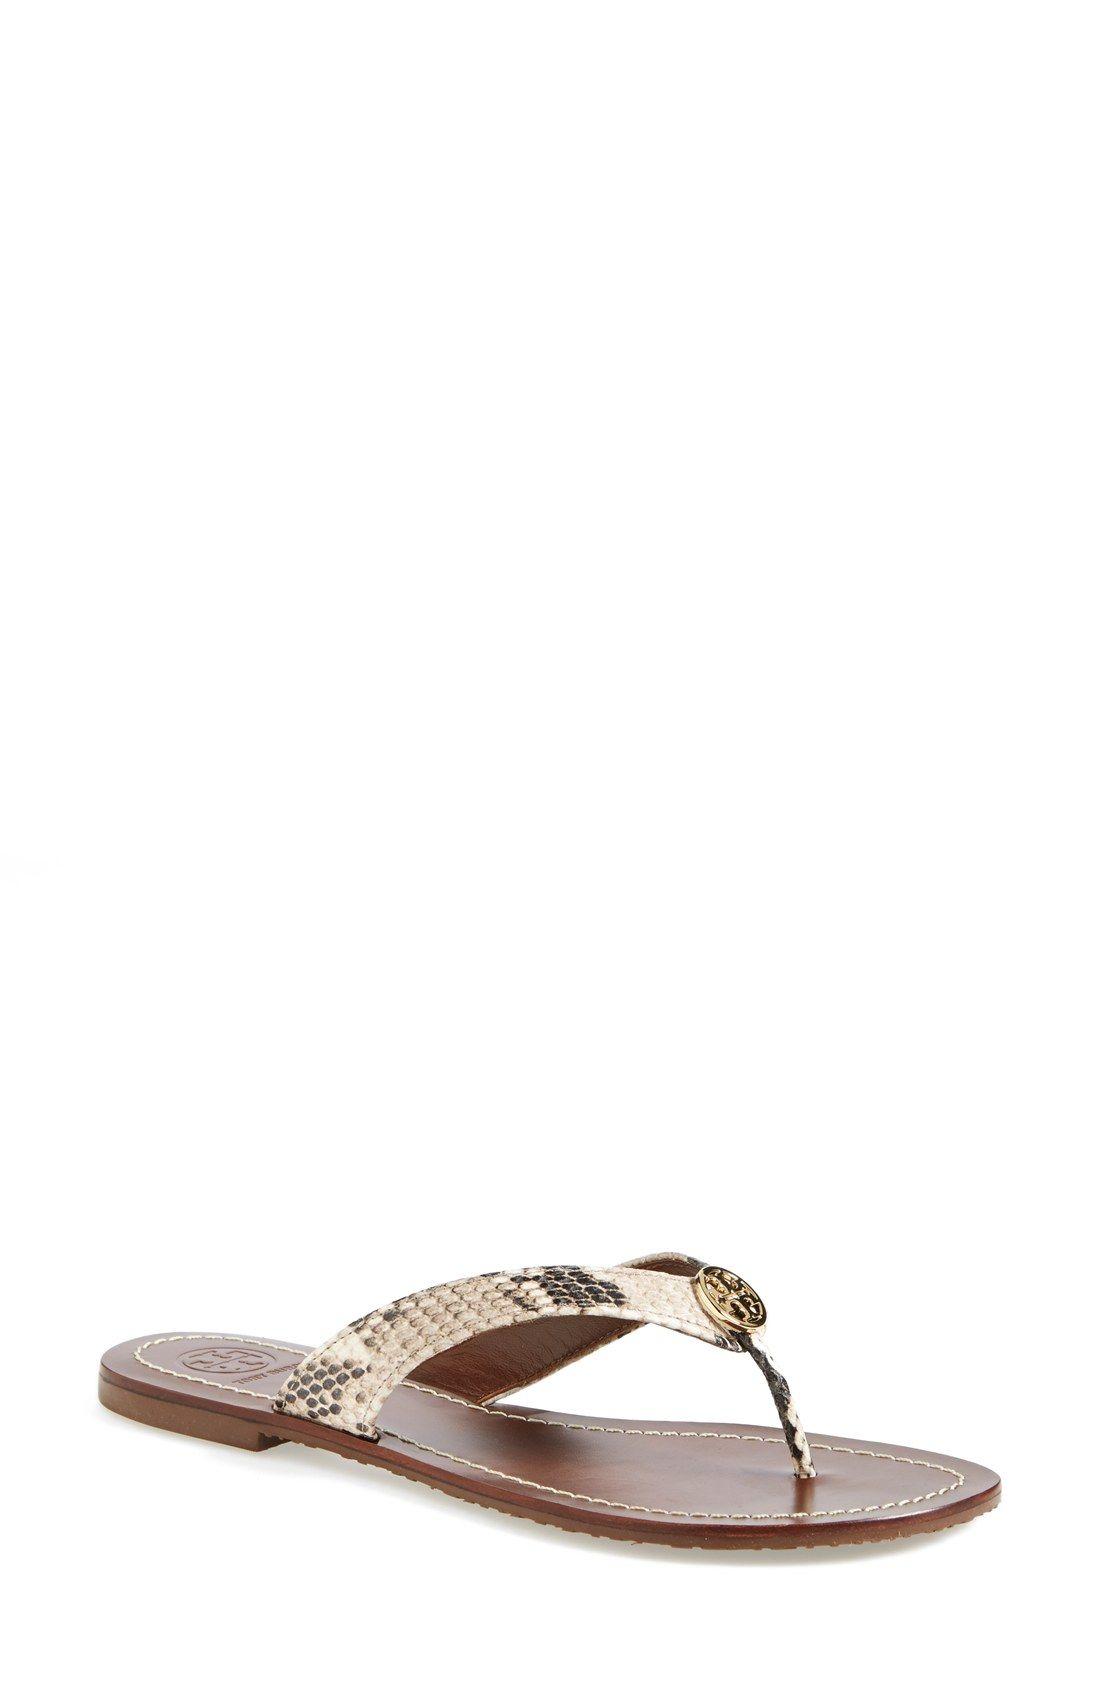 b2d4221d3c9f Tory Burch  Thora  Leather Thong Sandal (Women)